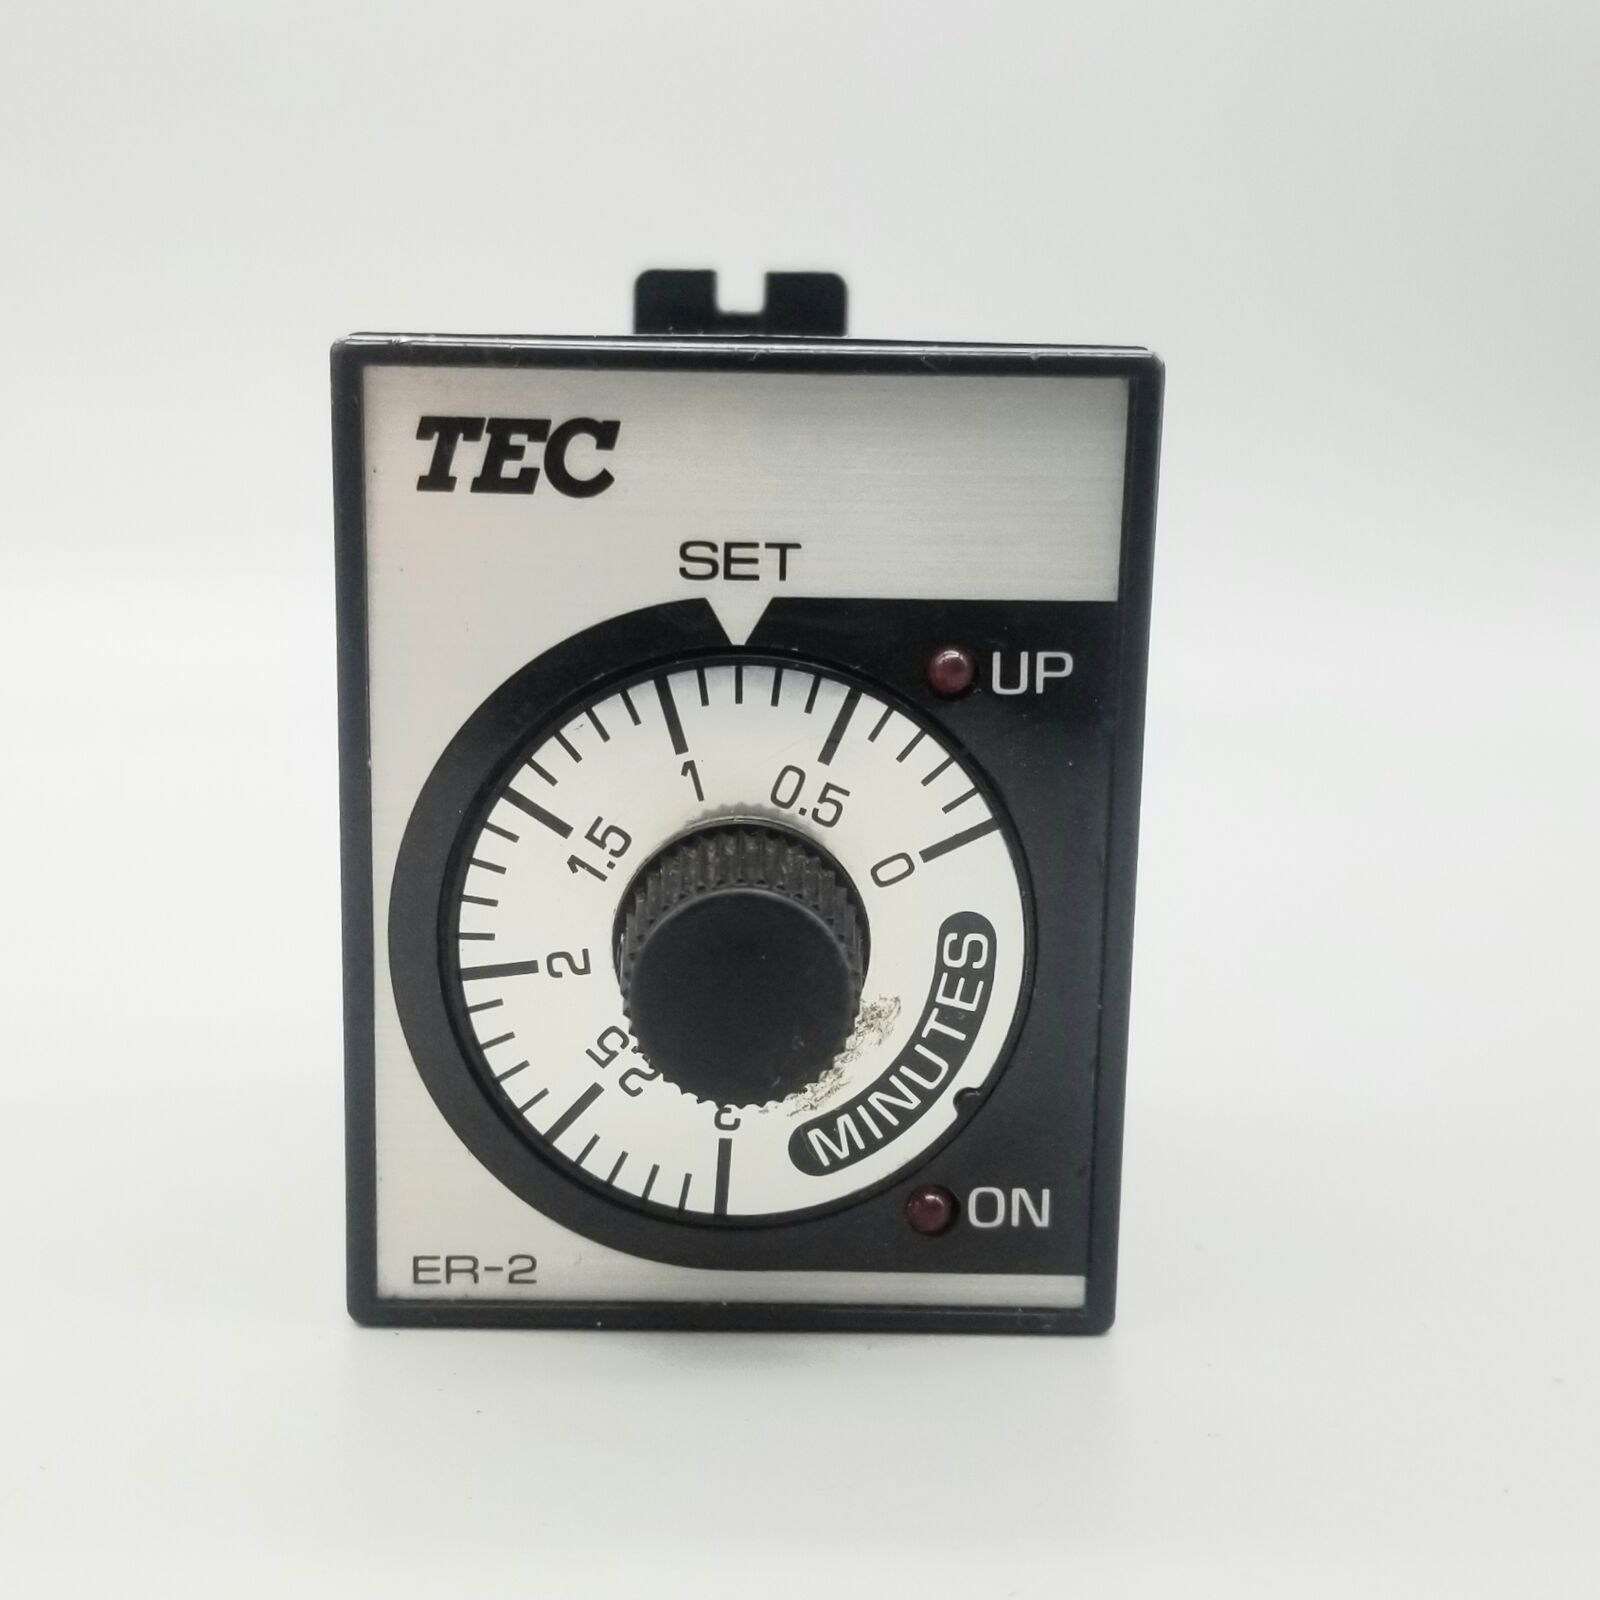 TEC Time Delay Relay, 120 VAC, ER-2103M-B Timer